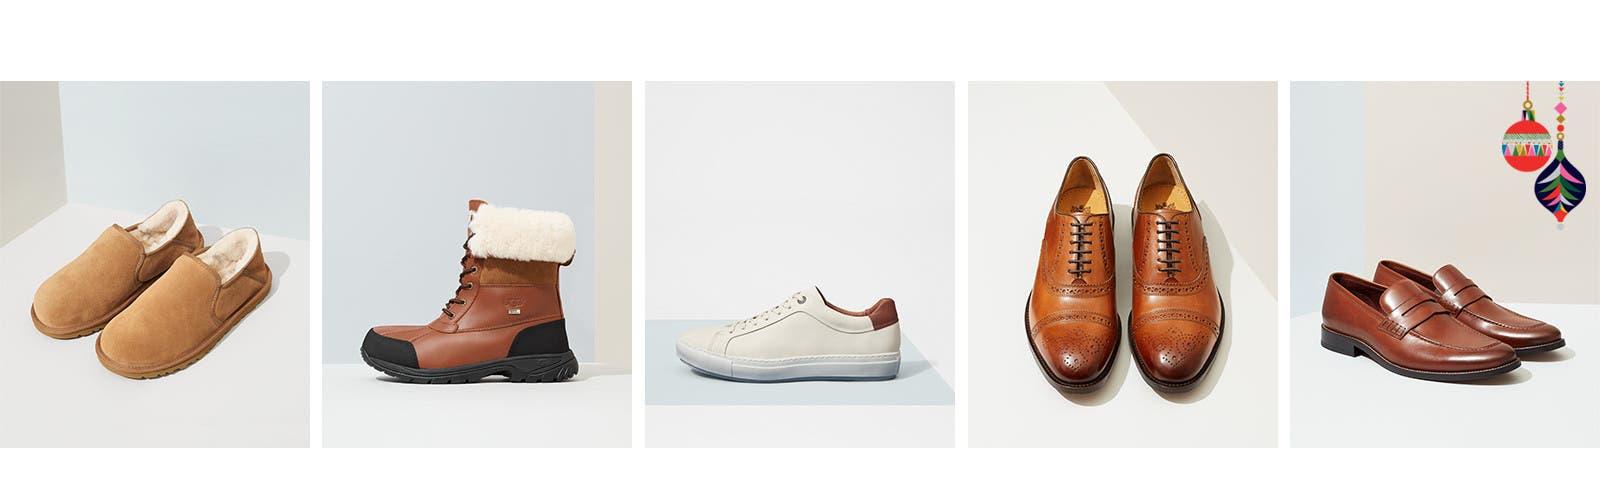 Top 5 Shoe Brands: PROJECT LasVegas pics